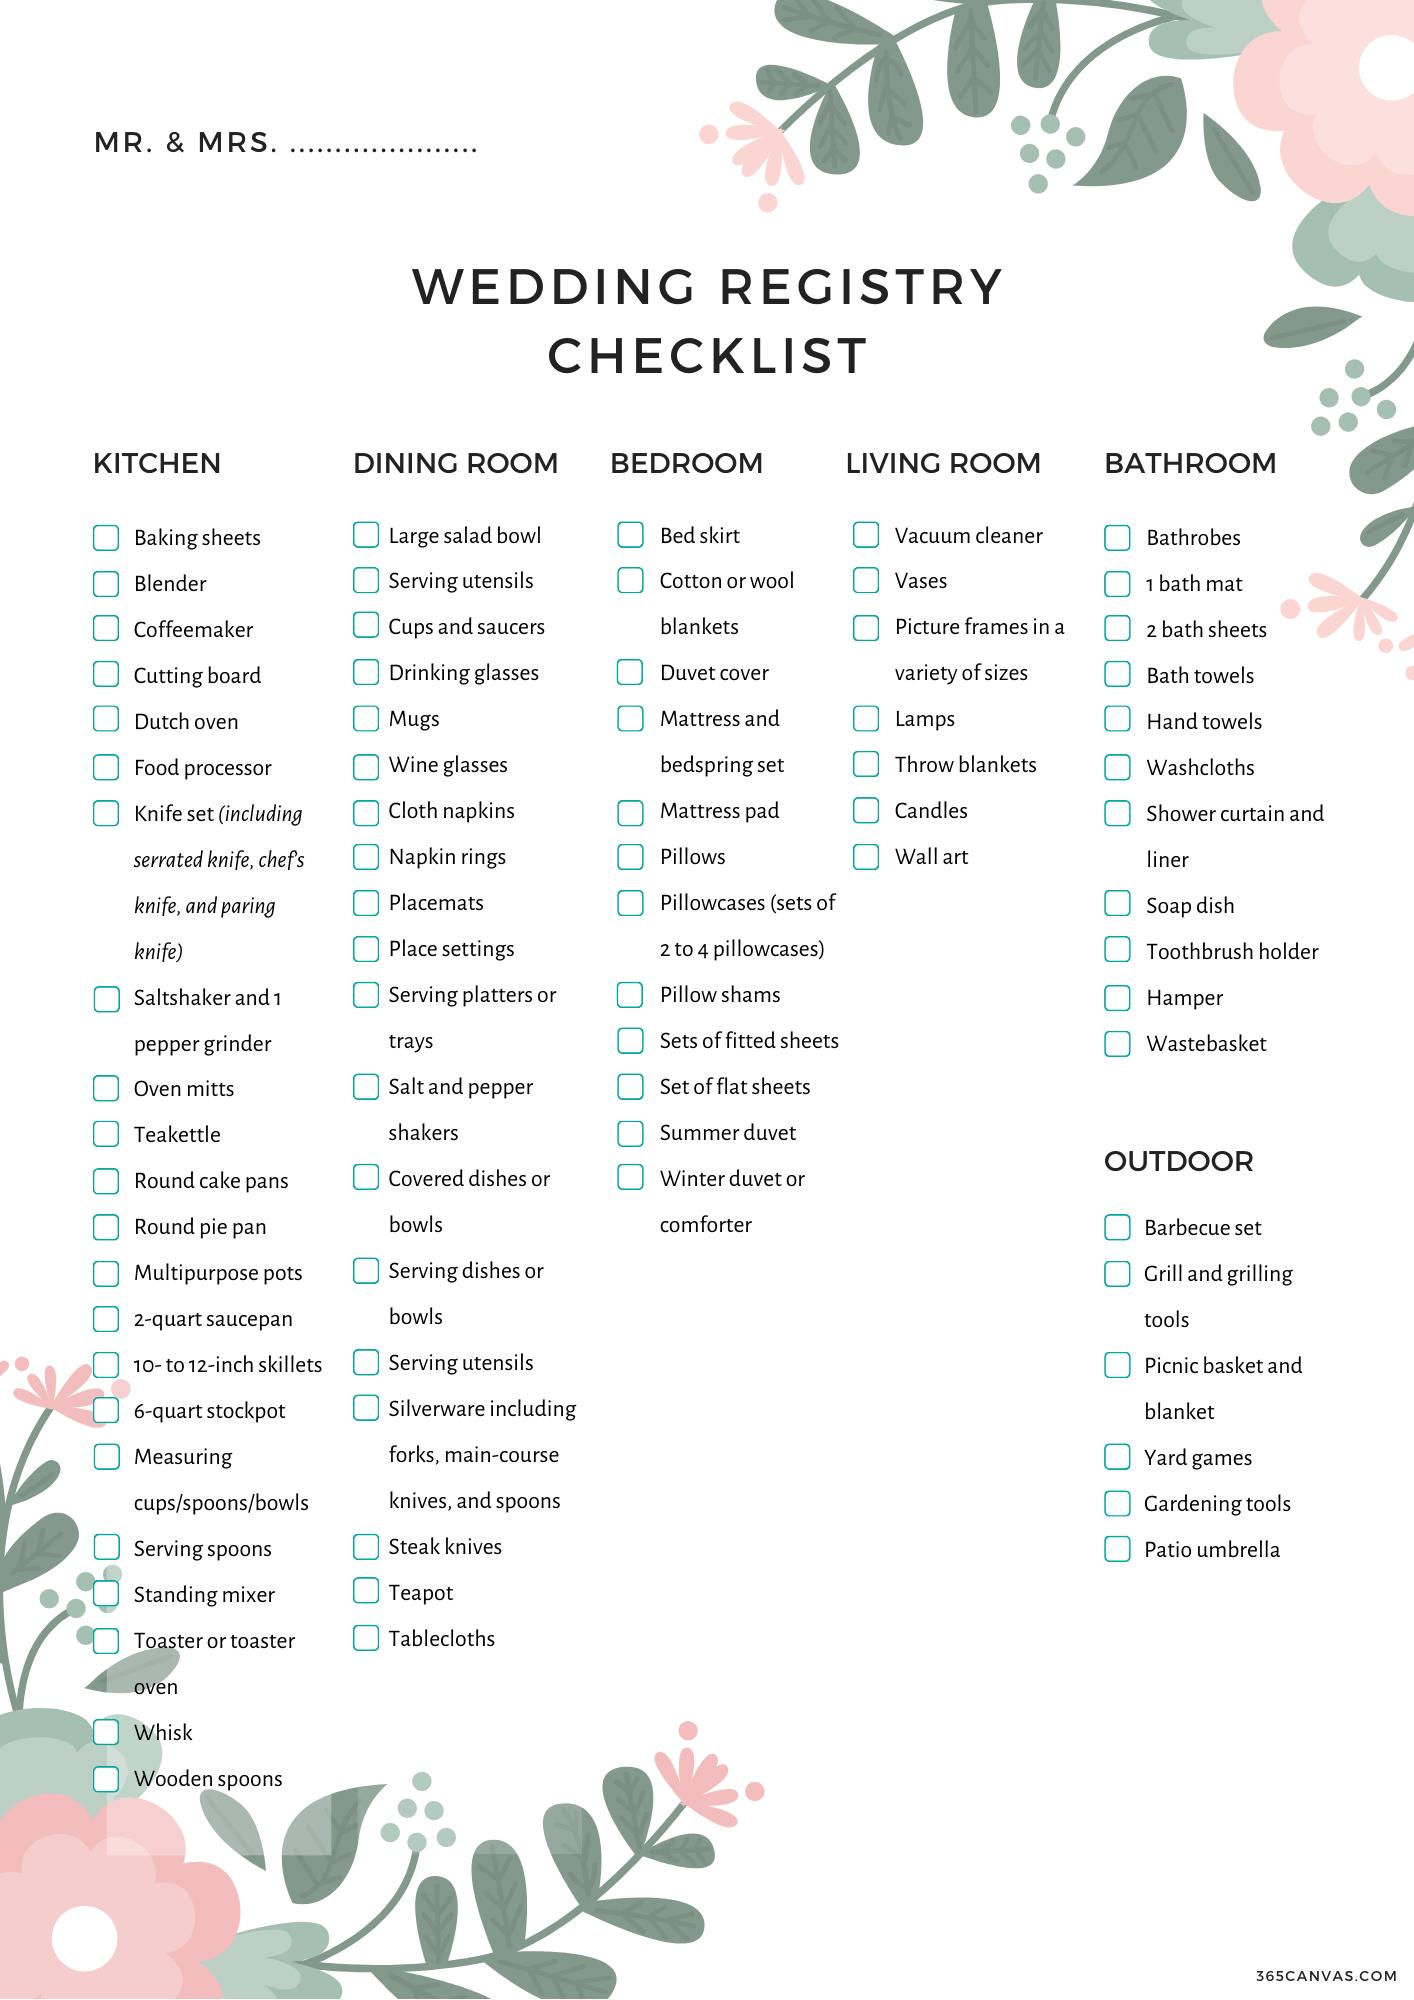 The Complete Wedding Registry Checklist Free Printable